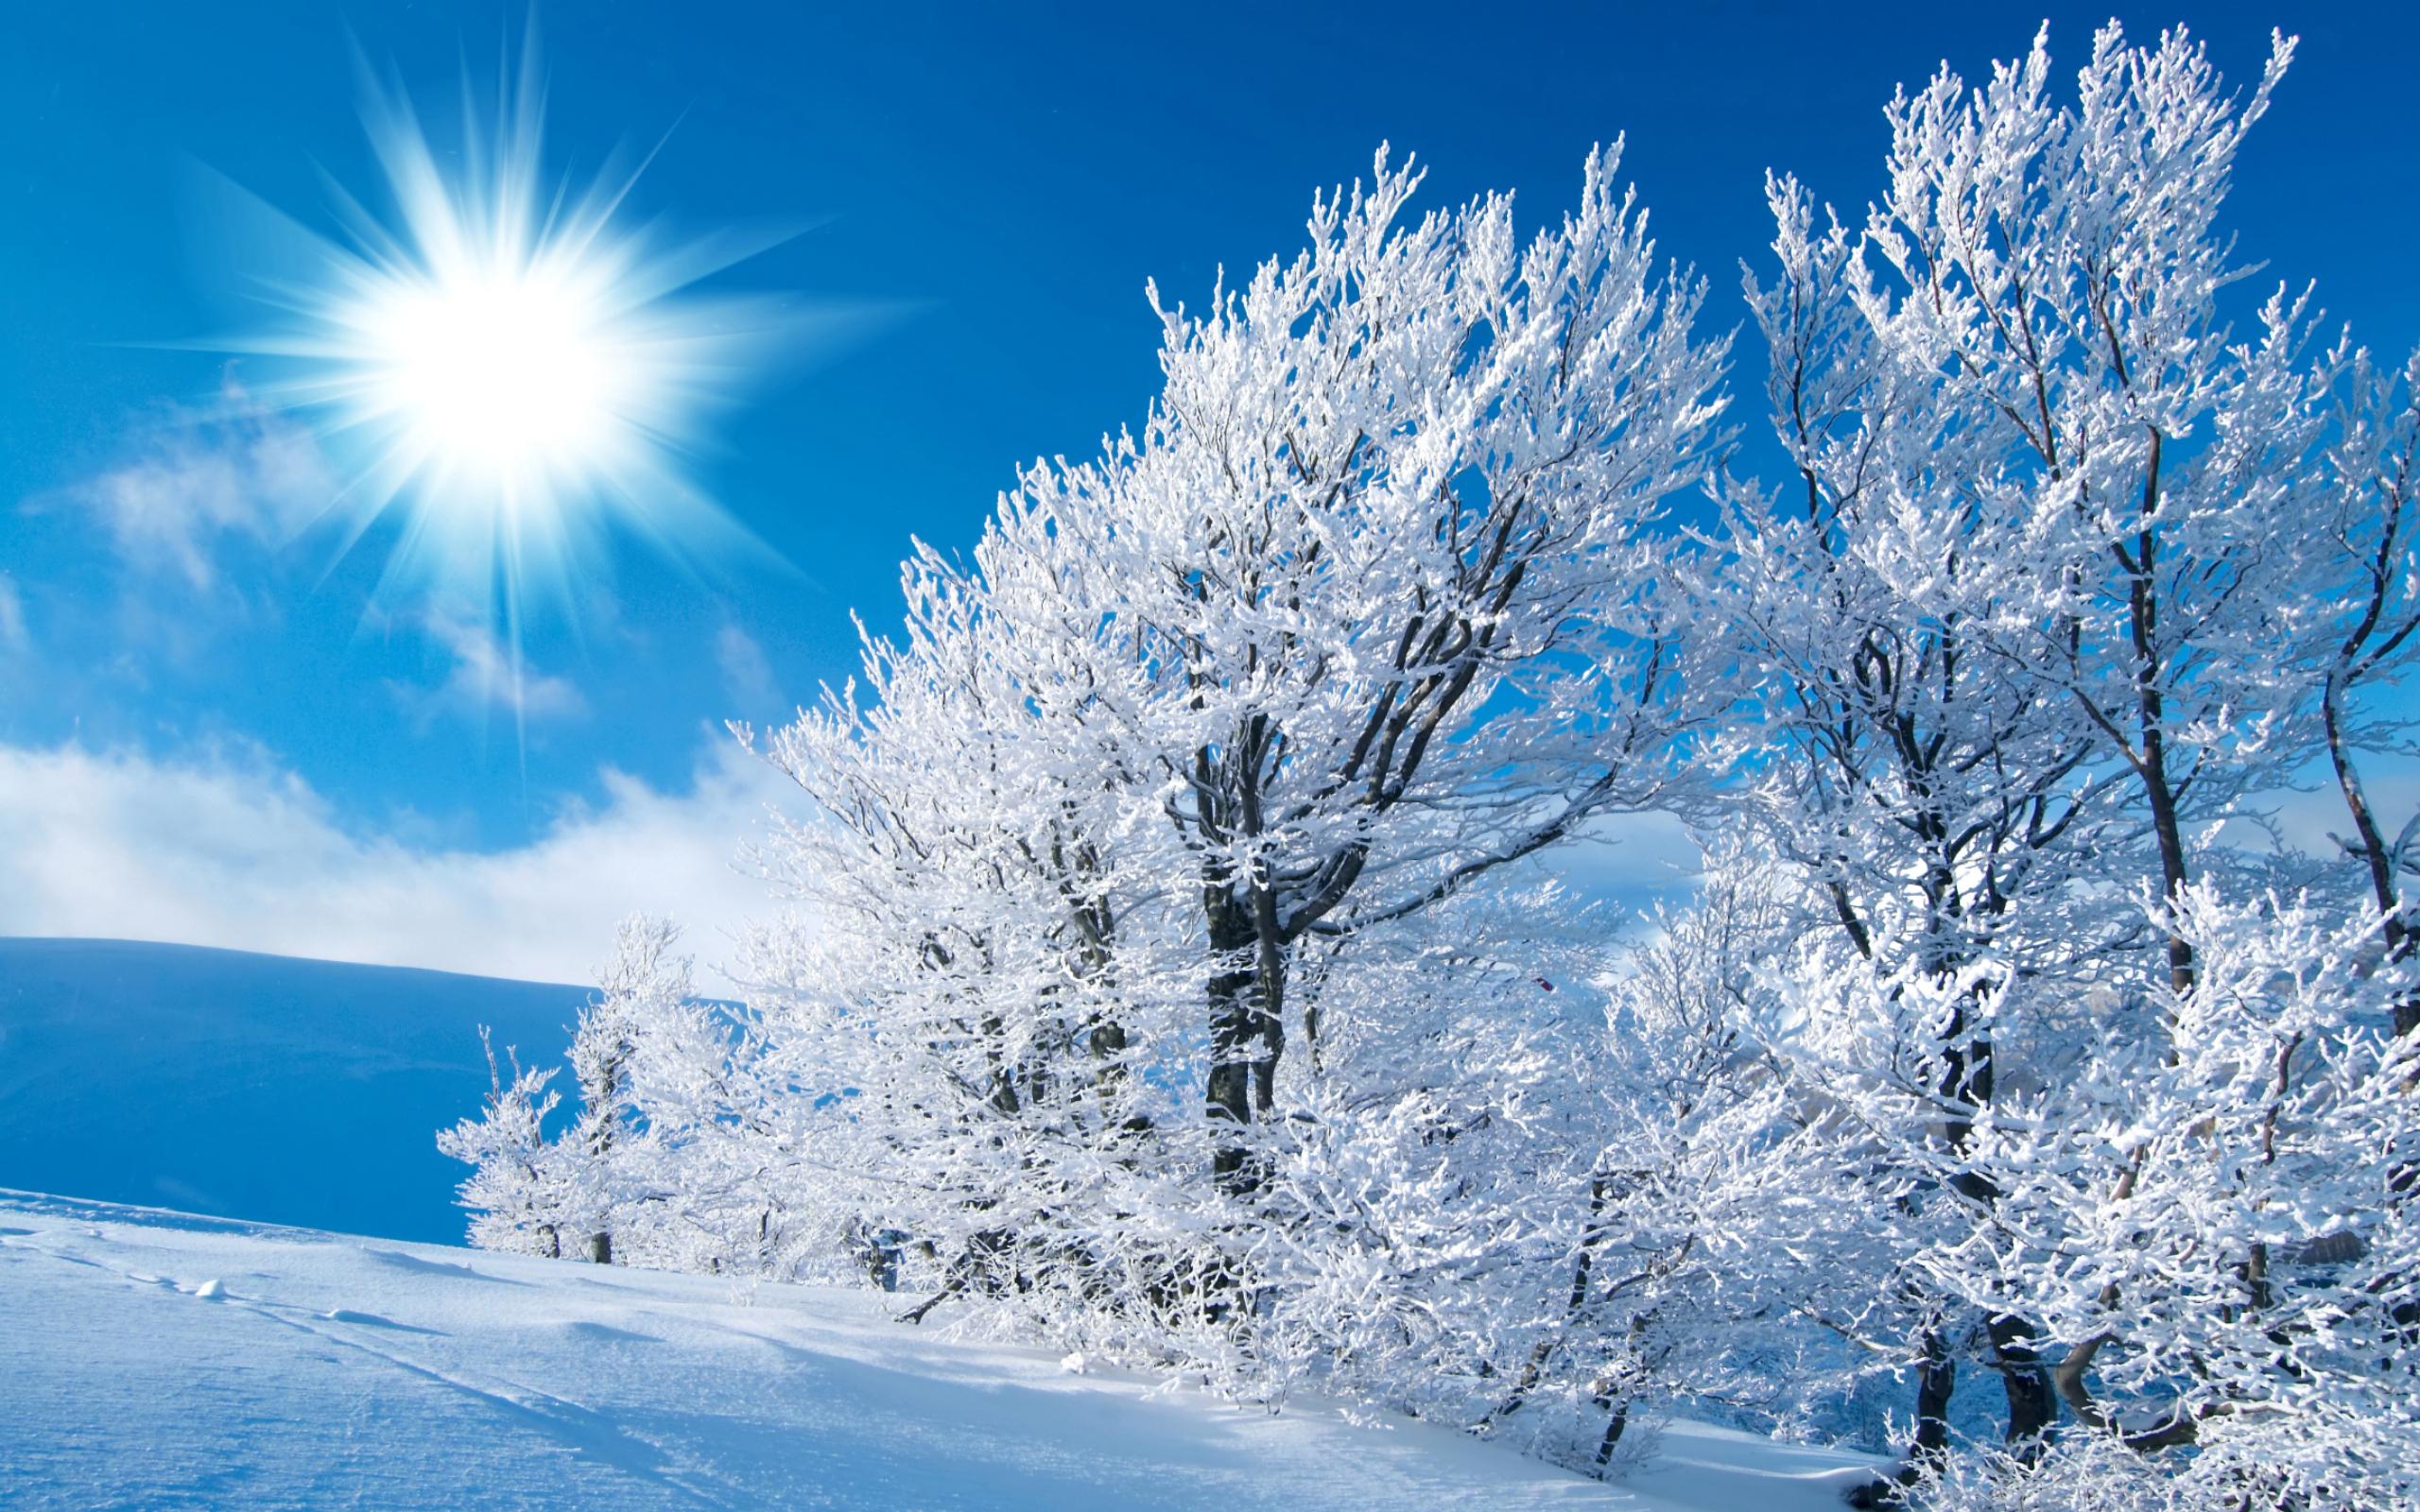 Winter Weather Wallpaper - WallpaperSafari